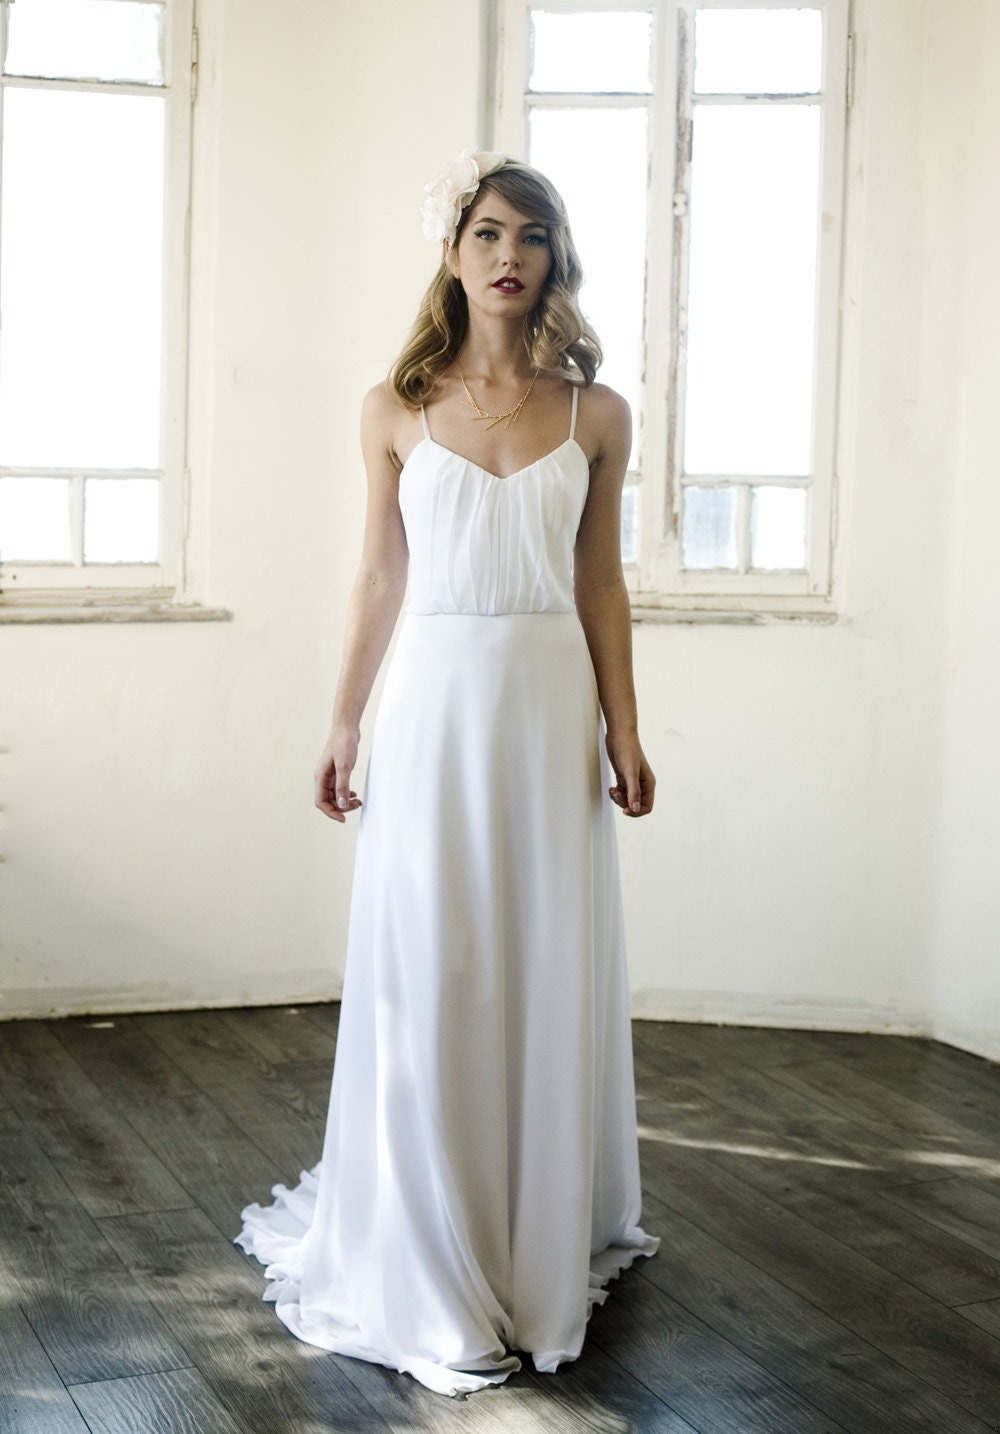 Simple wedding dress simple ivory beach wedding dress simple for Beach wedding dresses simple